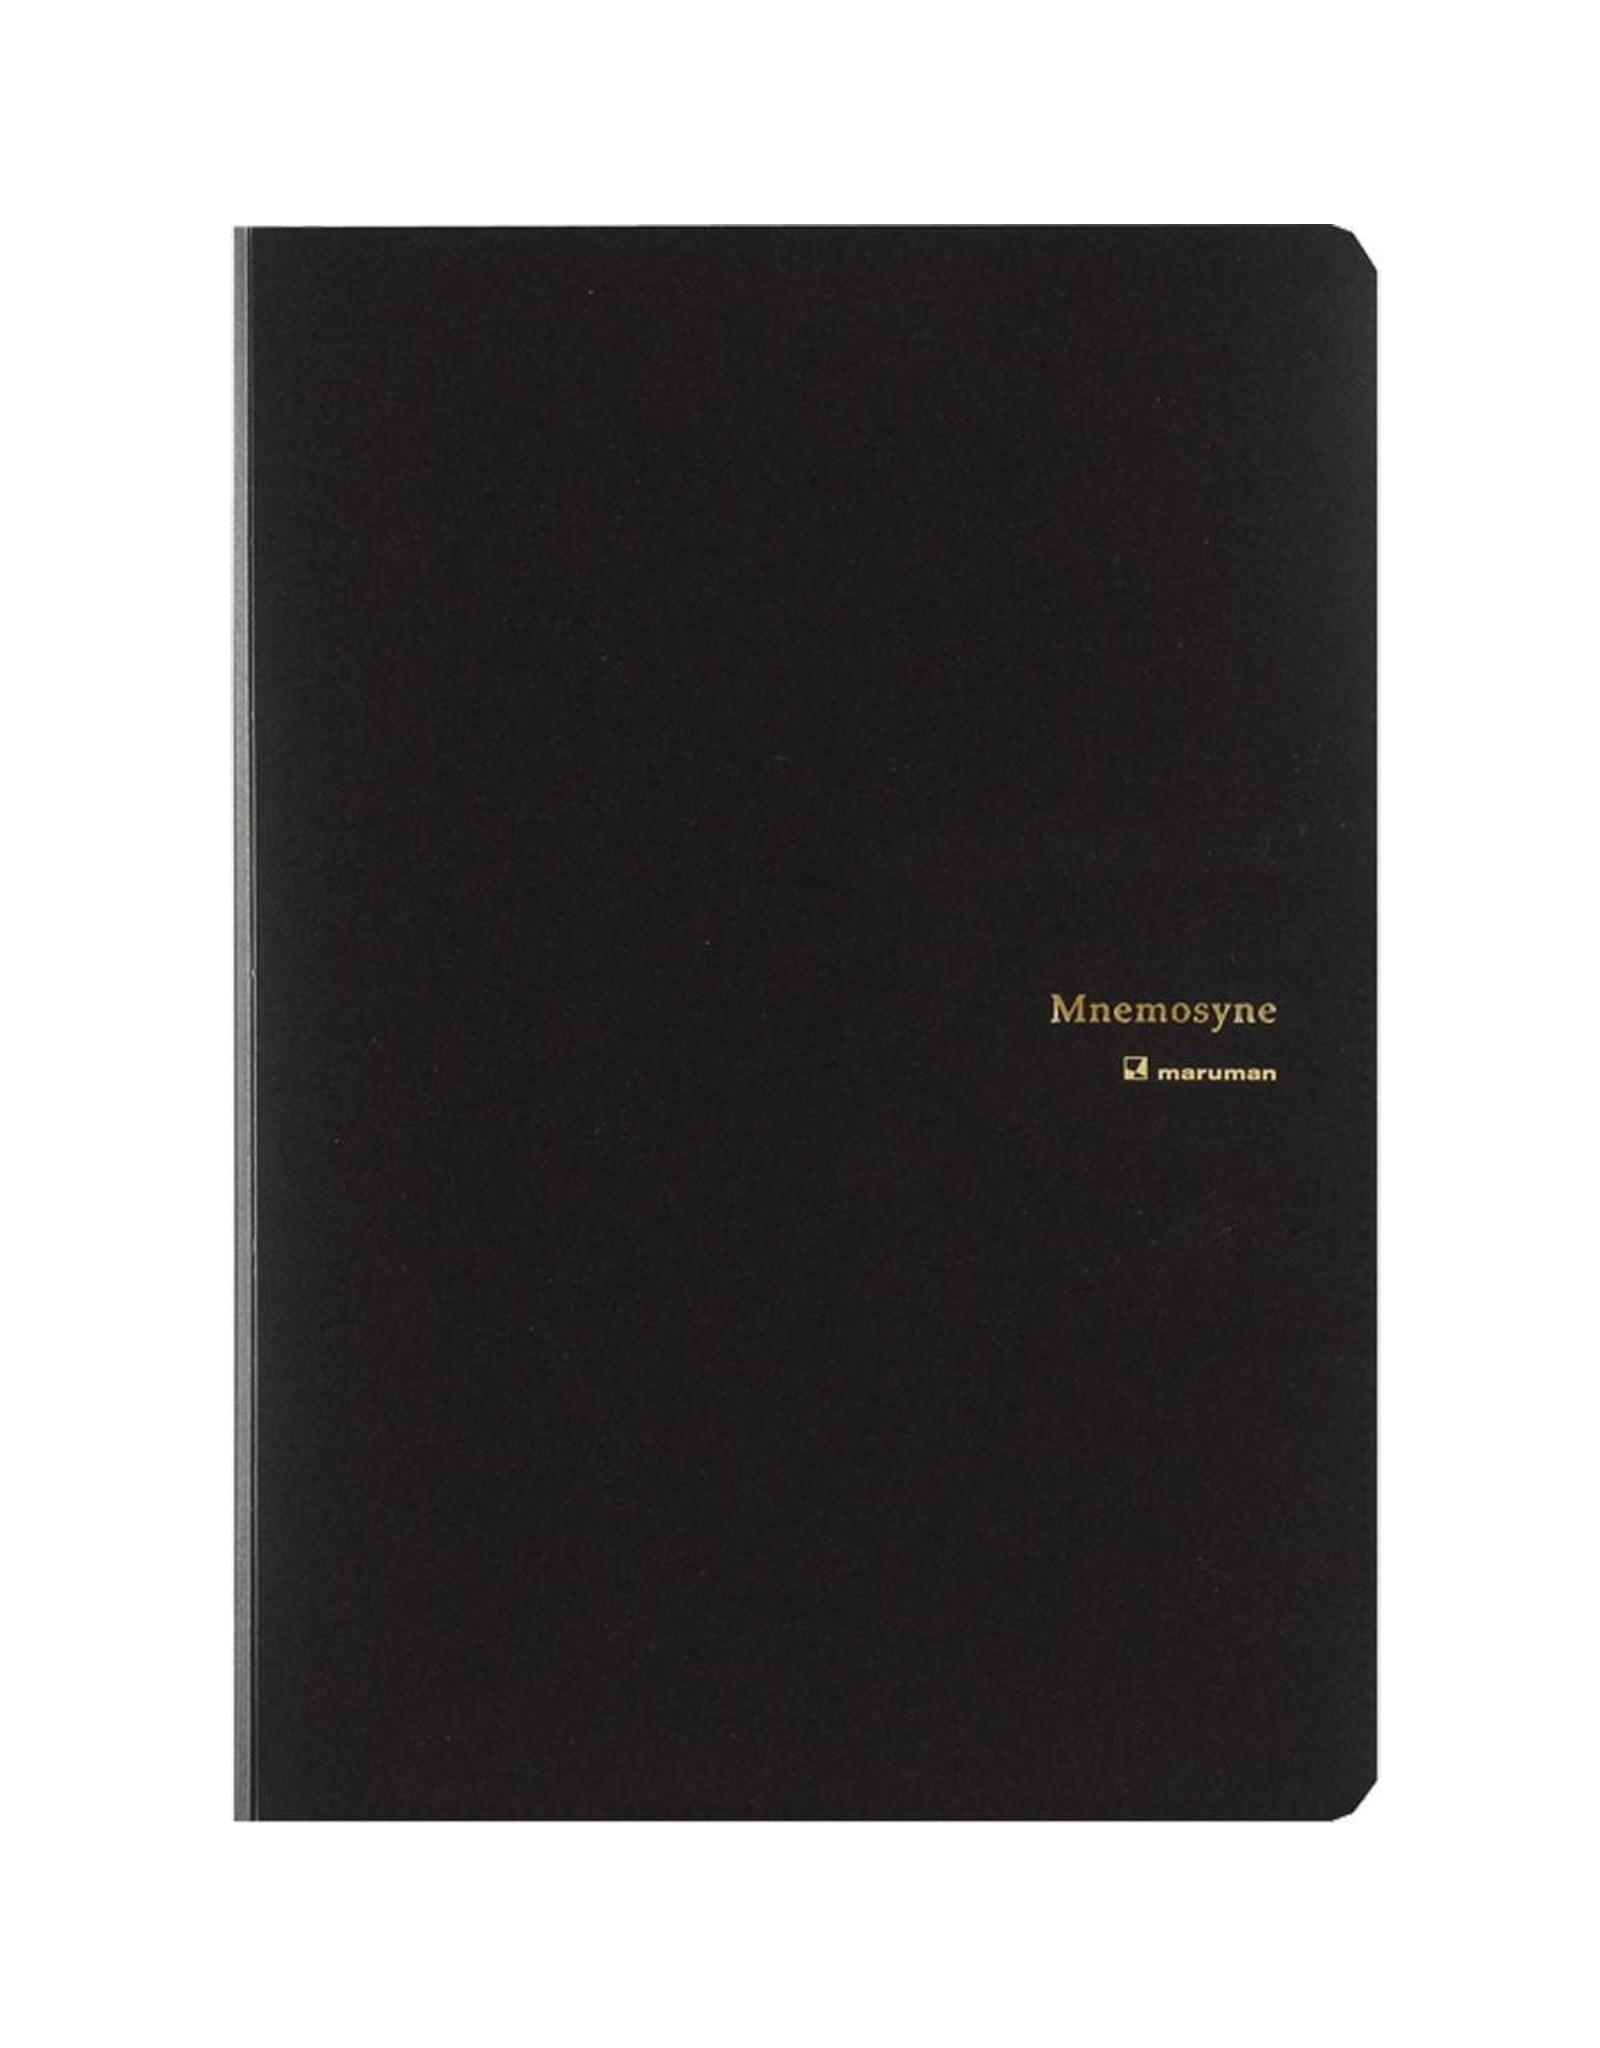 MARUMAN HN188A MNEMOSYNE NOTEPAD AND HOLDER A5